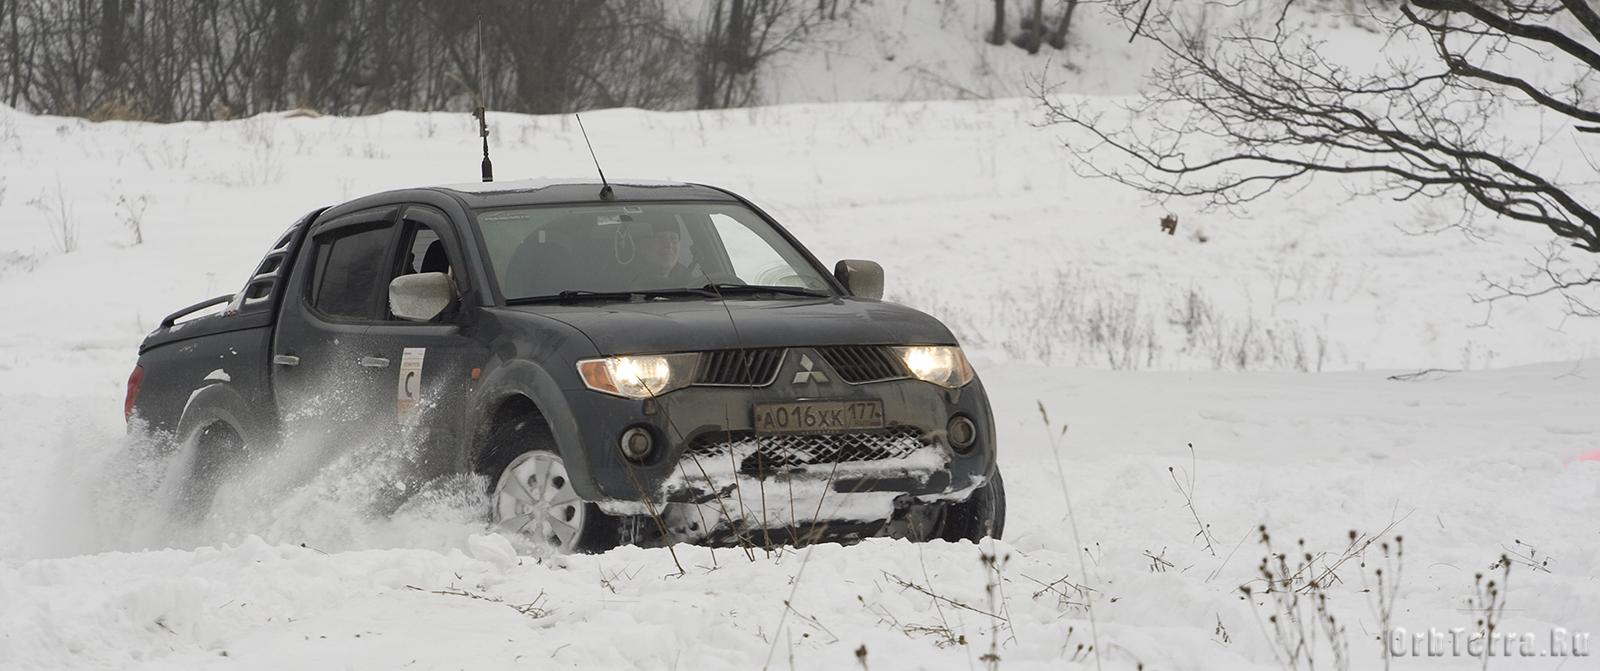 Масленица 2009 с www.pickupclub.ru